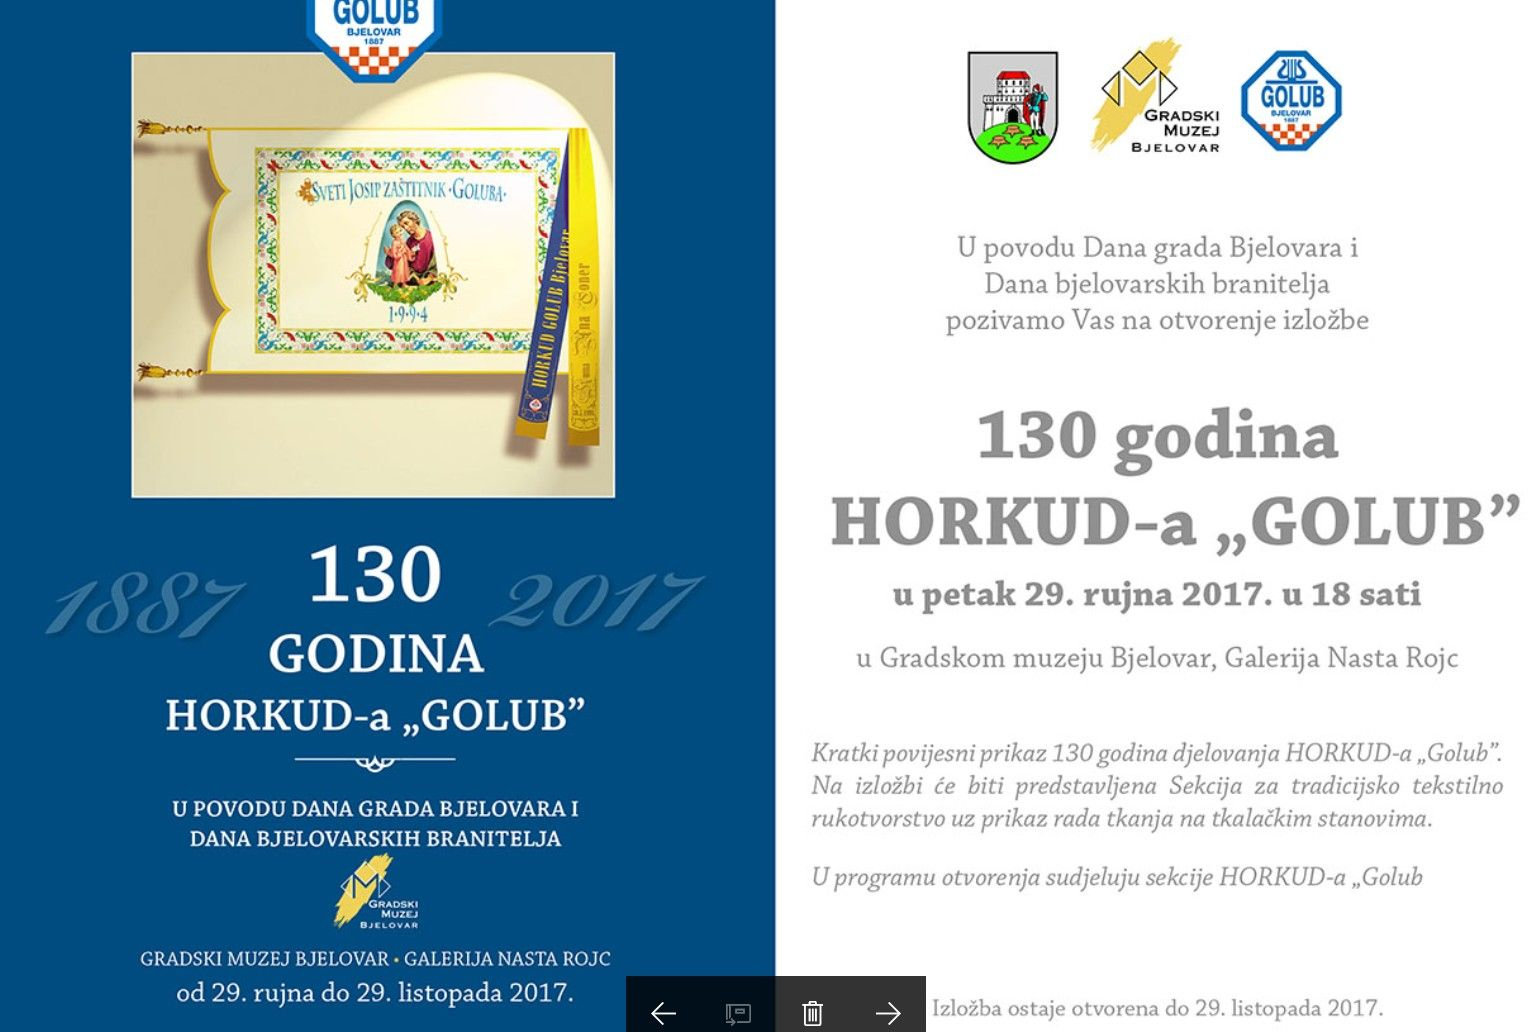 130 godina HORKUD-a